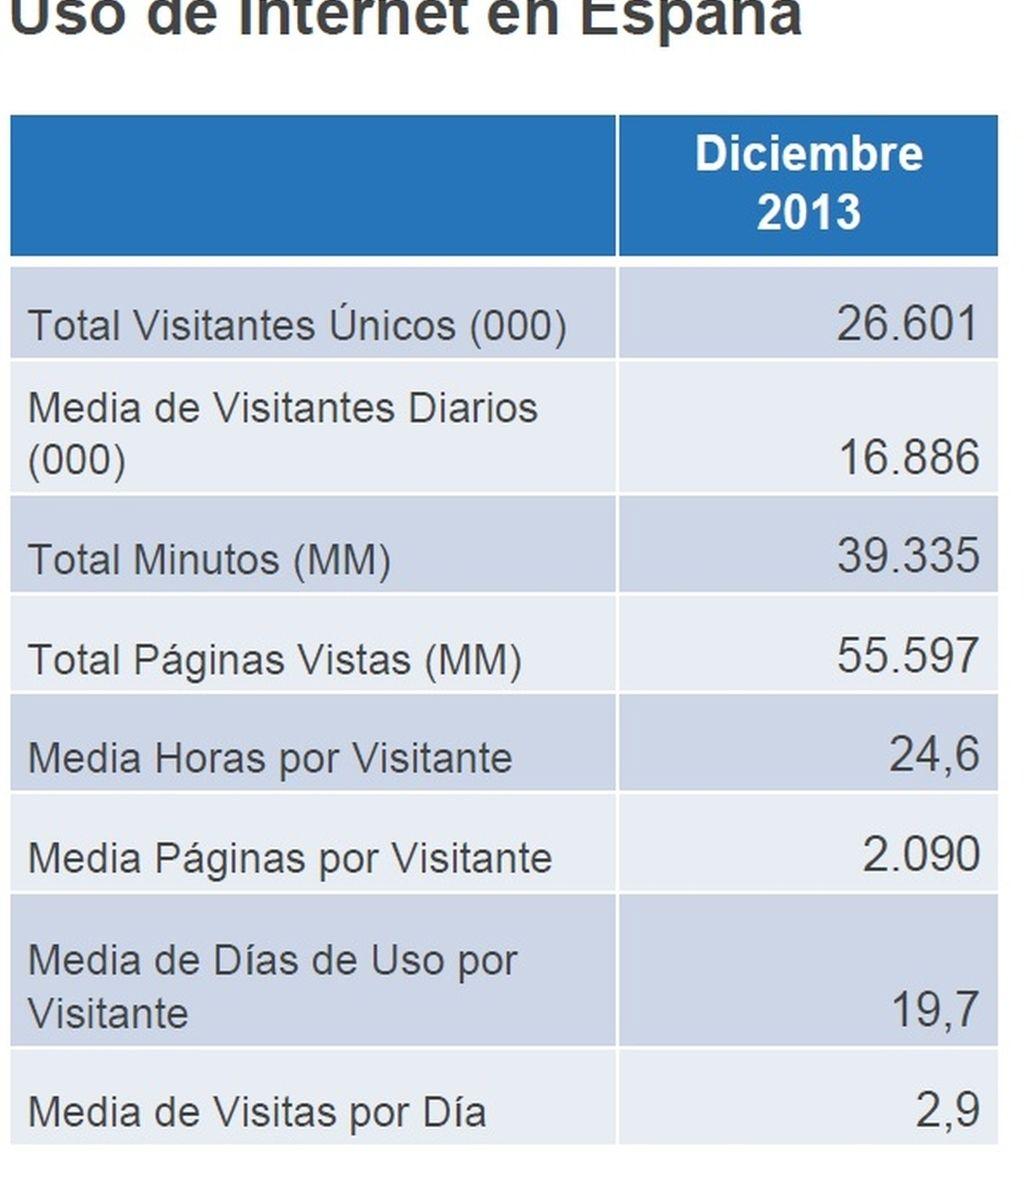 comscore, datos de diciembre 2013, audiencias